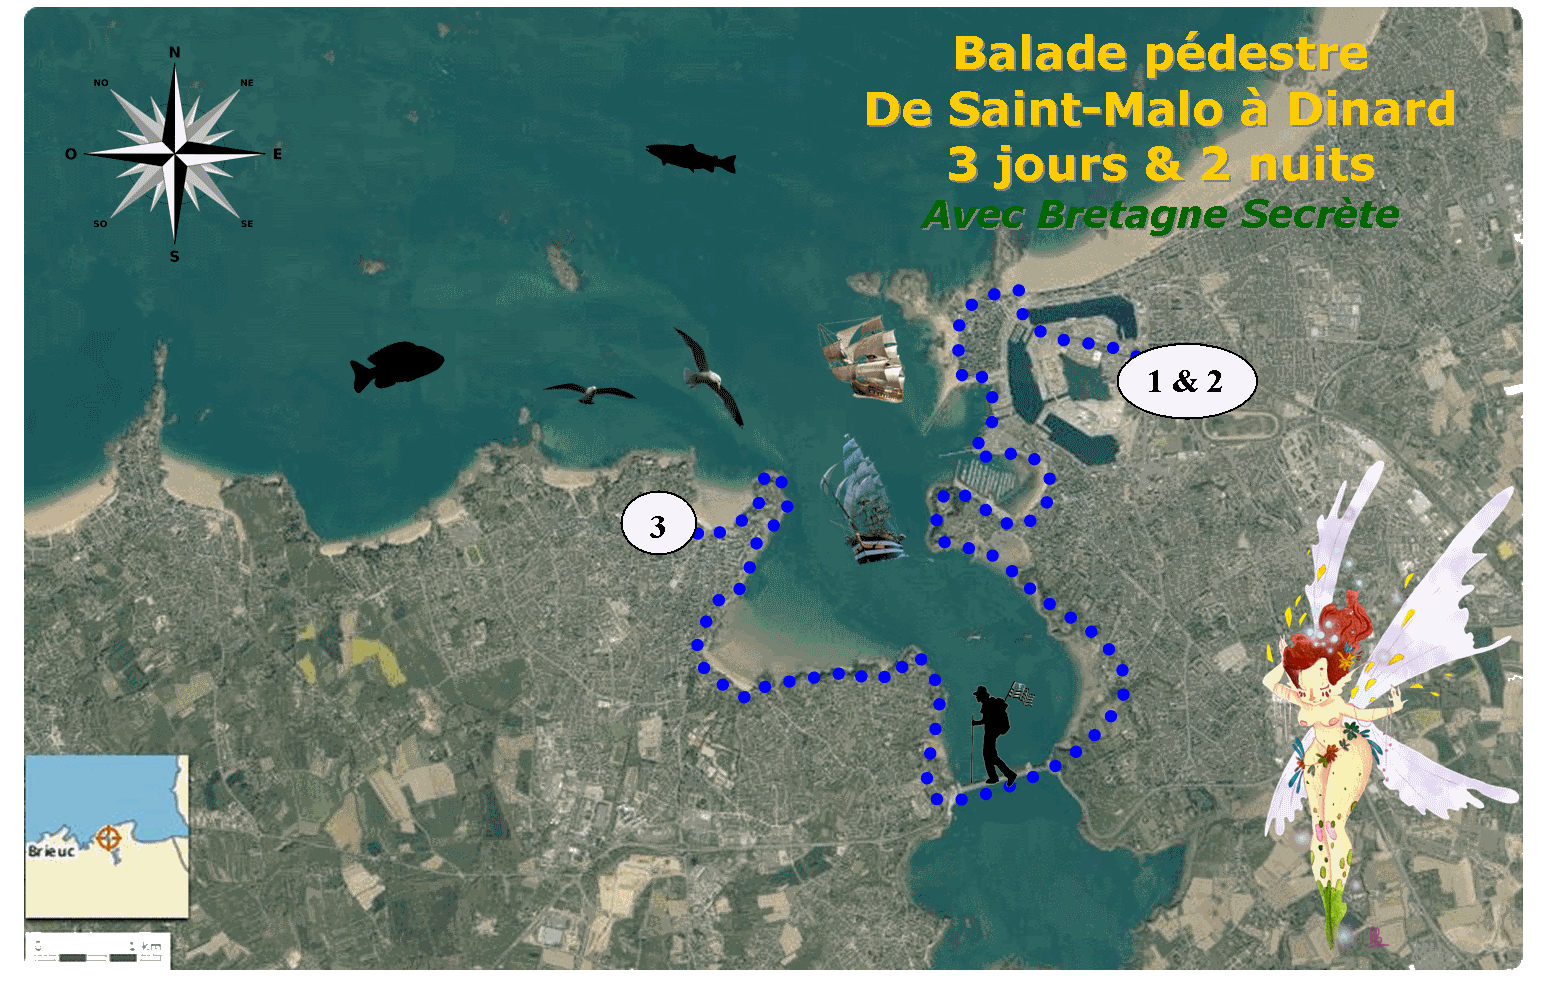 Carte Bretagne Randonnee.Carte Randonnee Pedestre Saint Malo Dinard Bretagne Secrete Agence